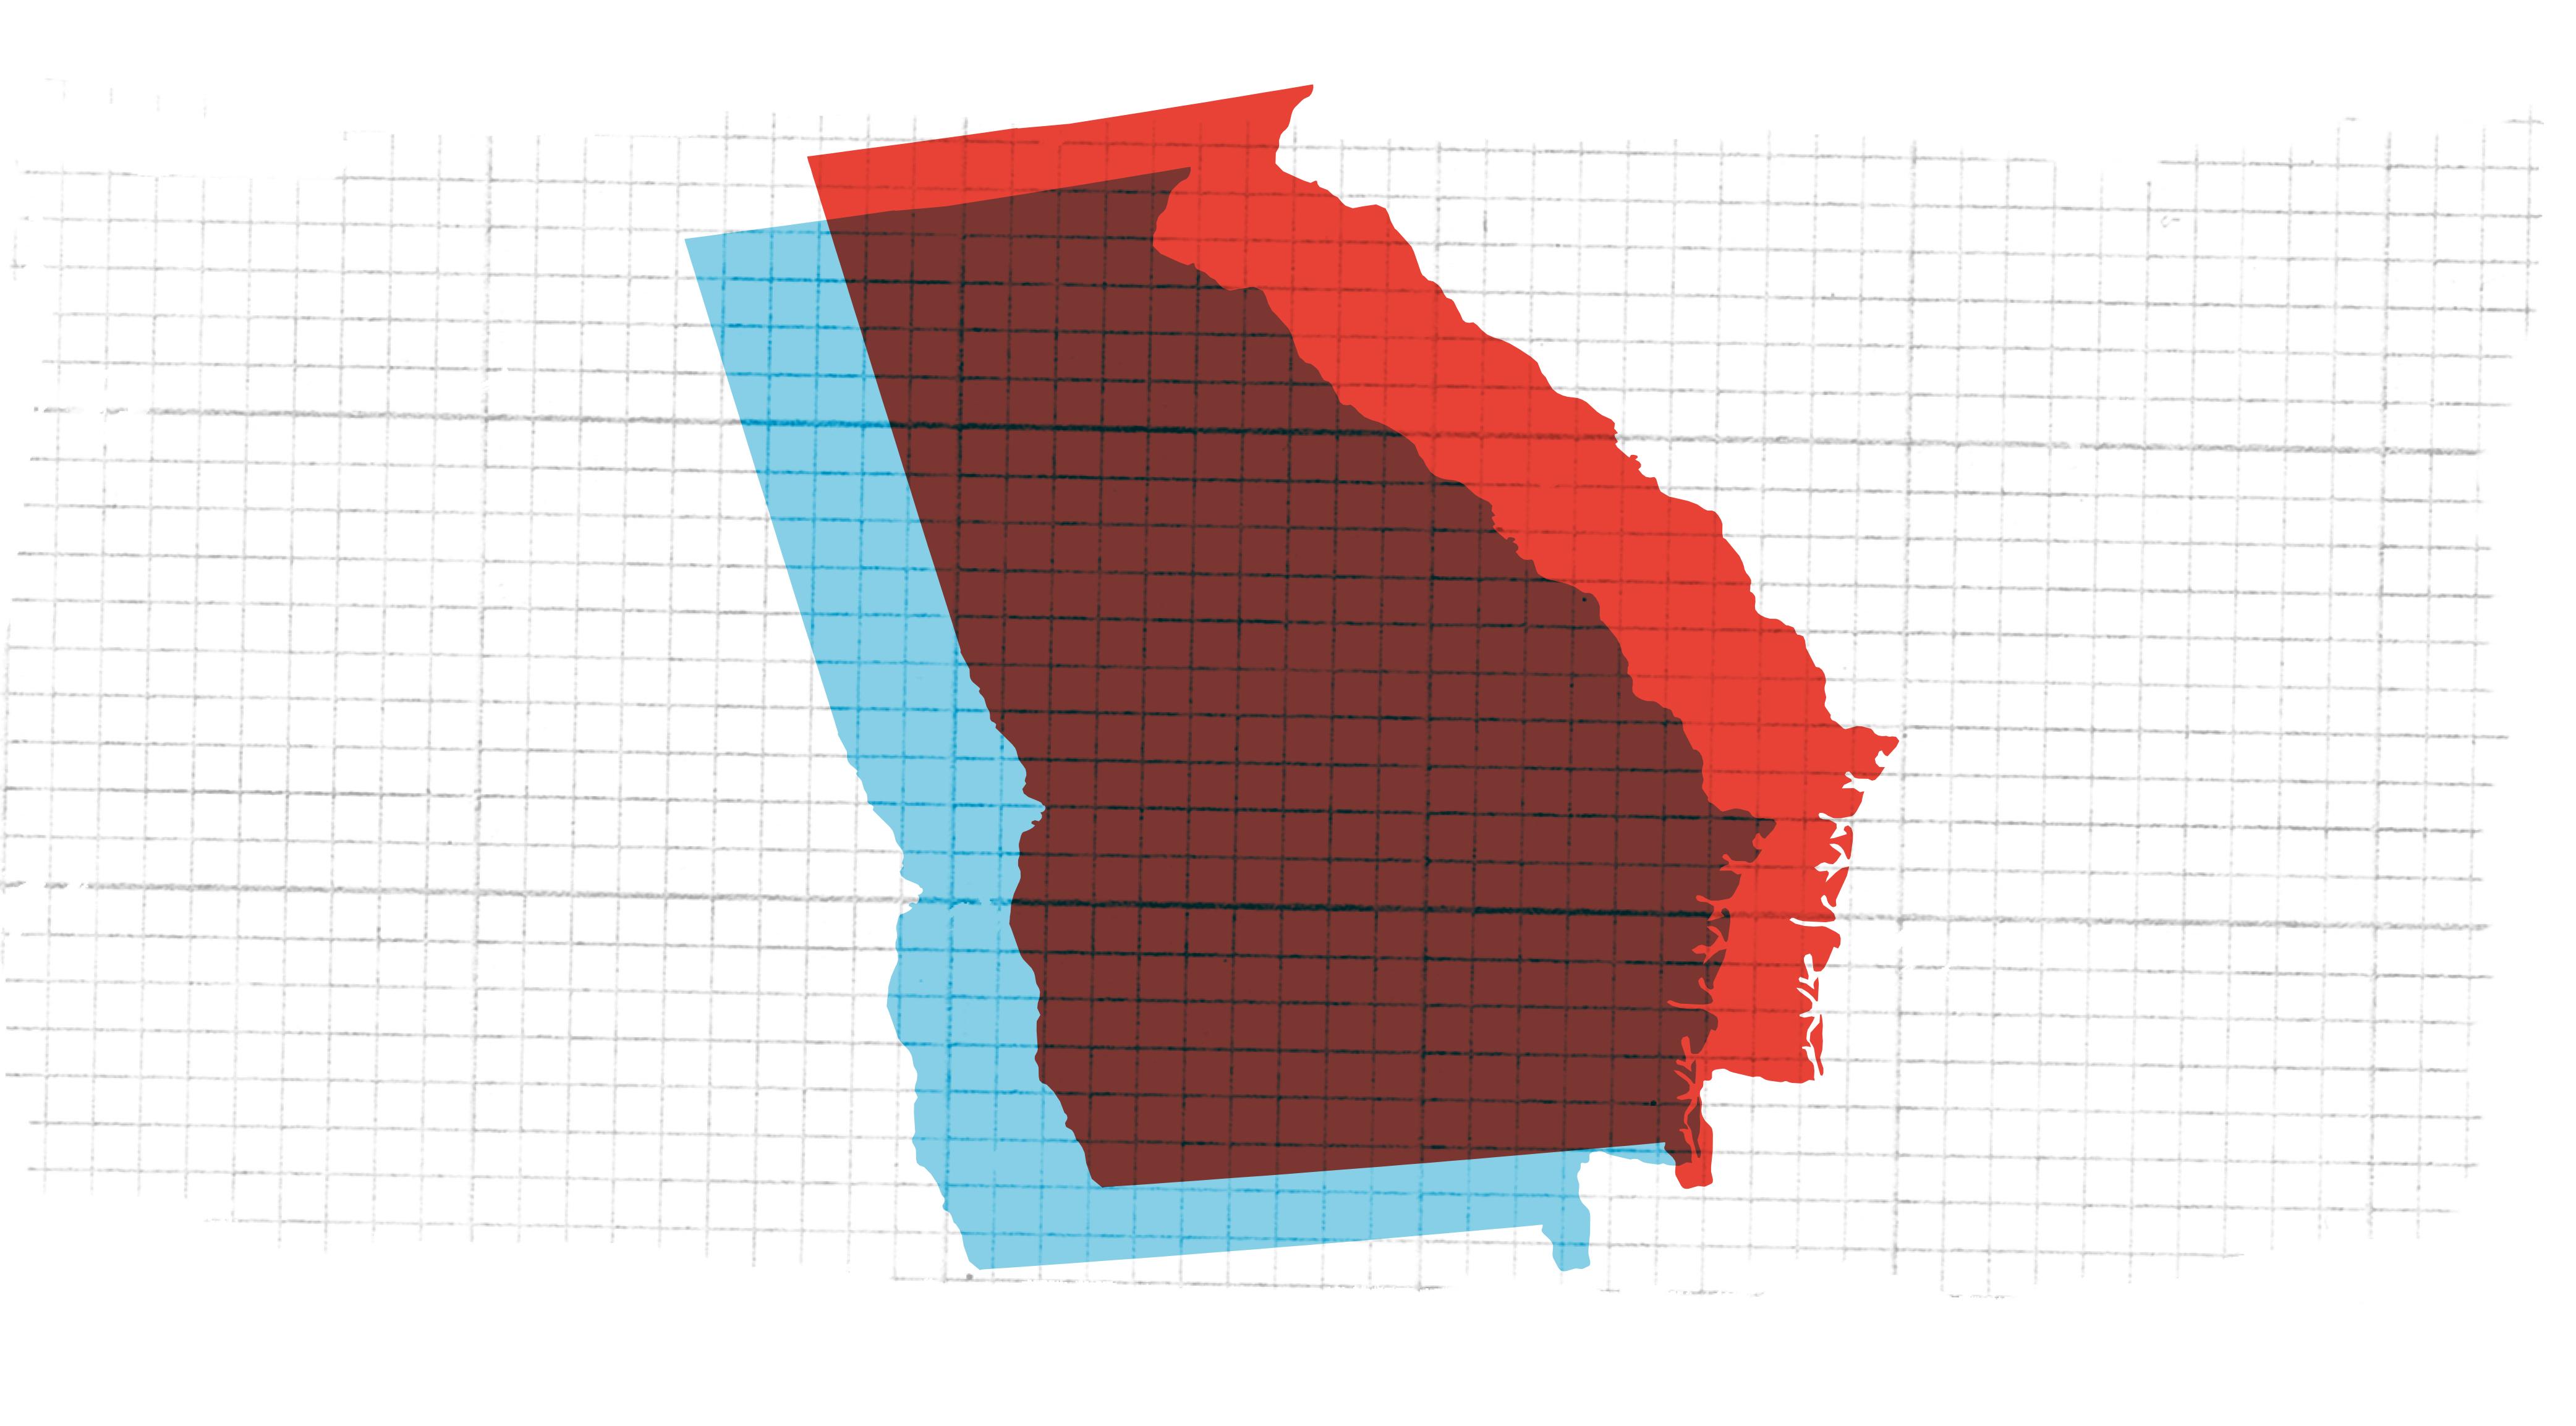 Georgia secretary of state live results: Barrow vs. Raffensperger - Vox